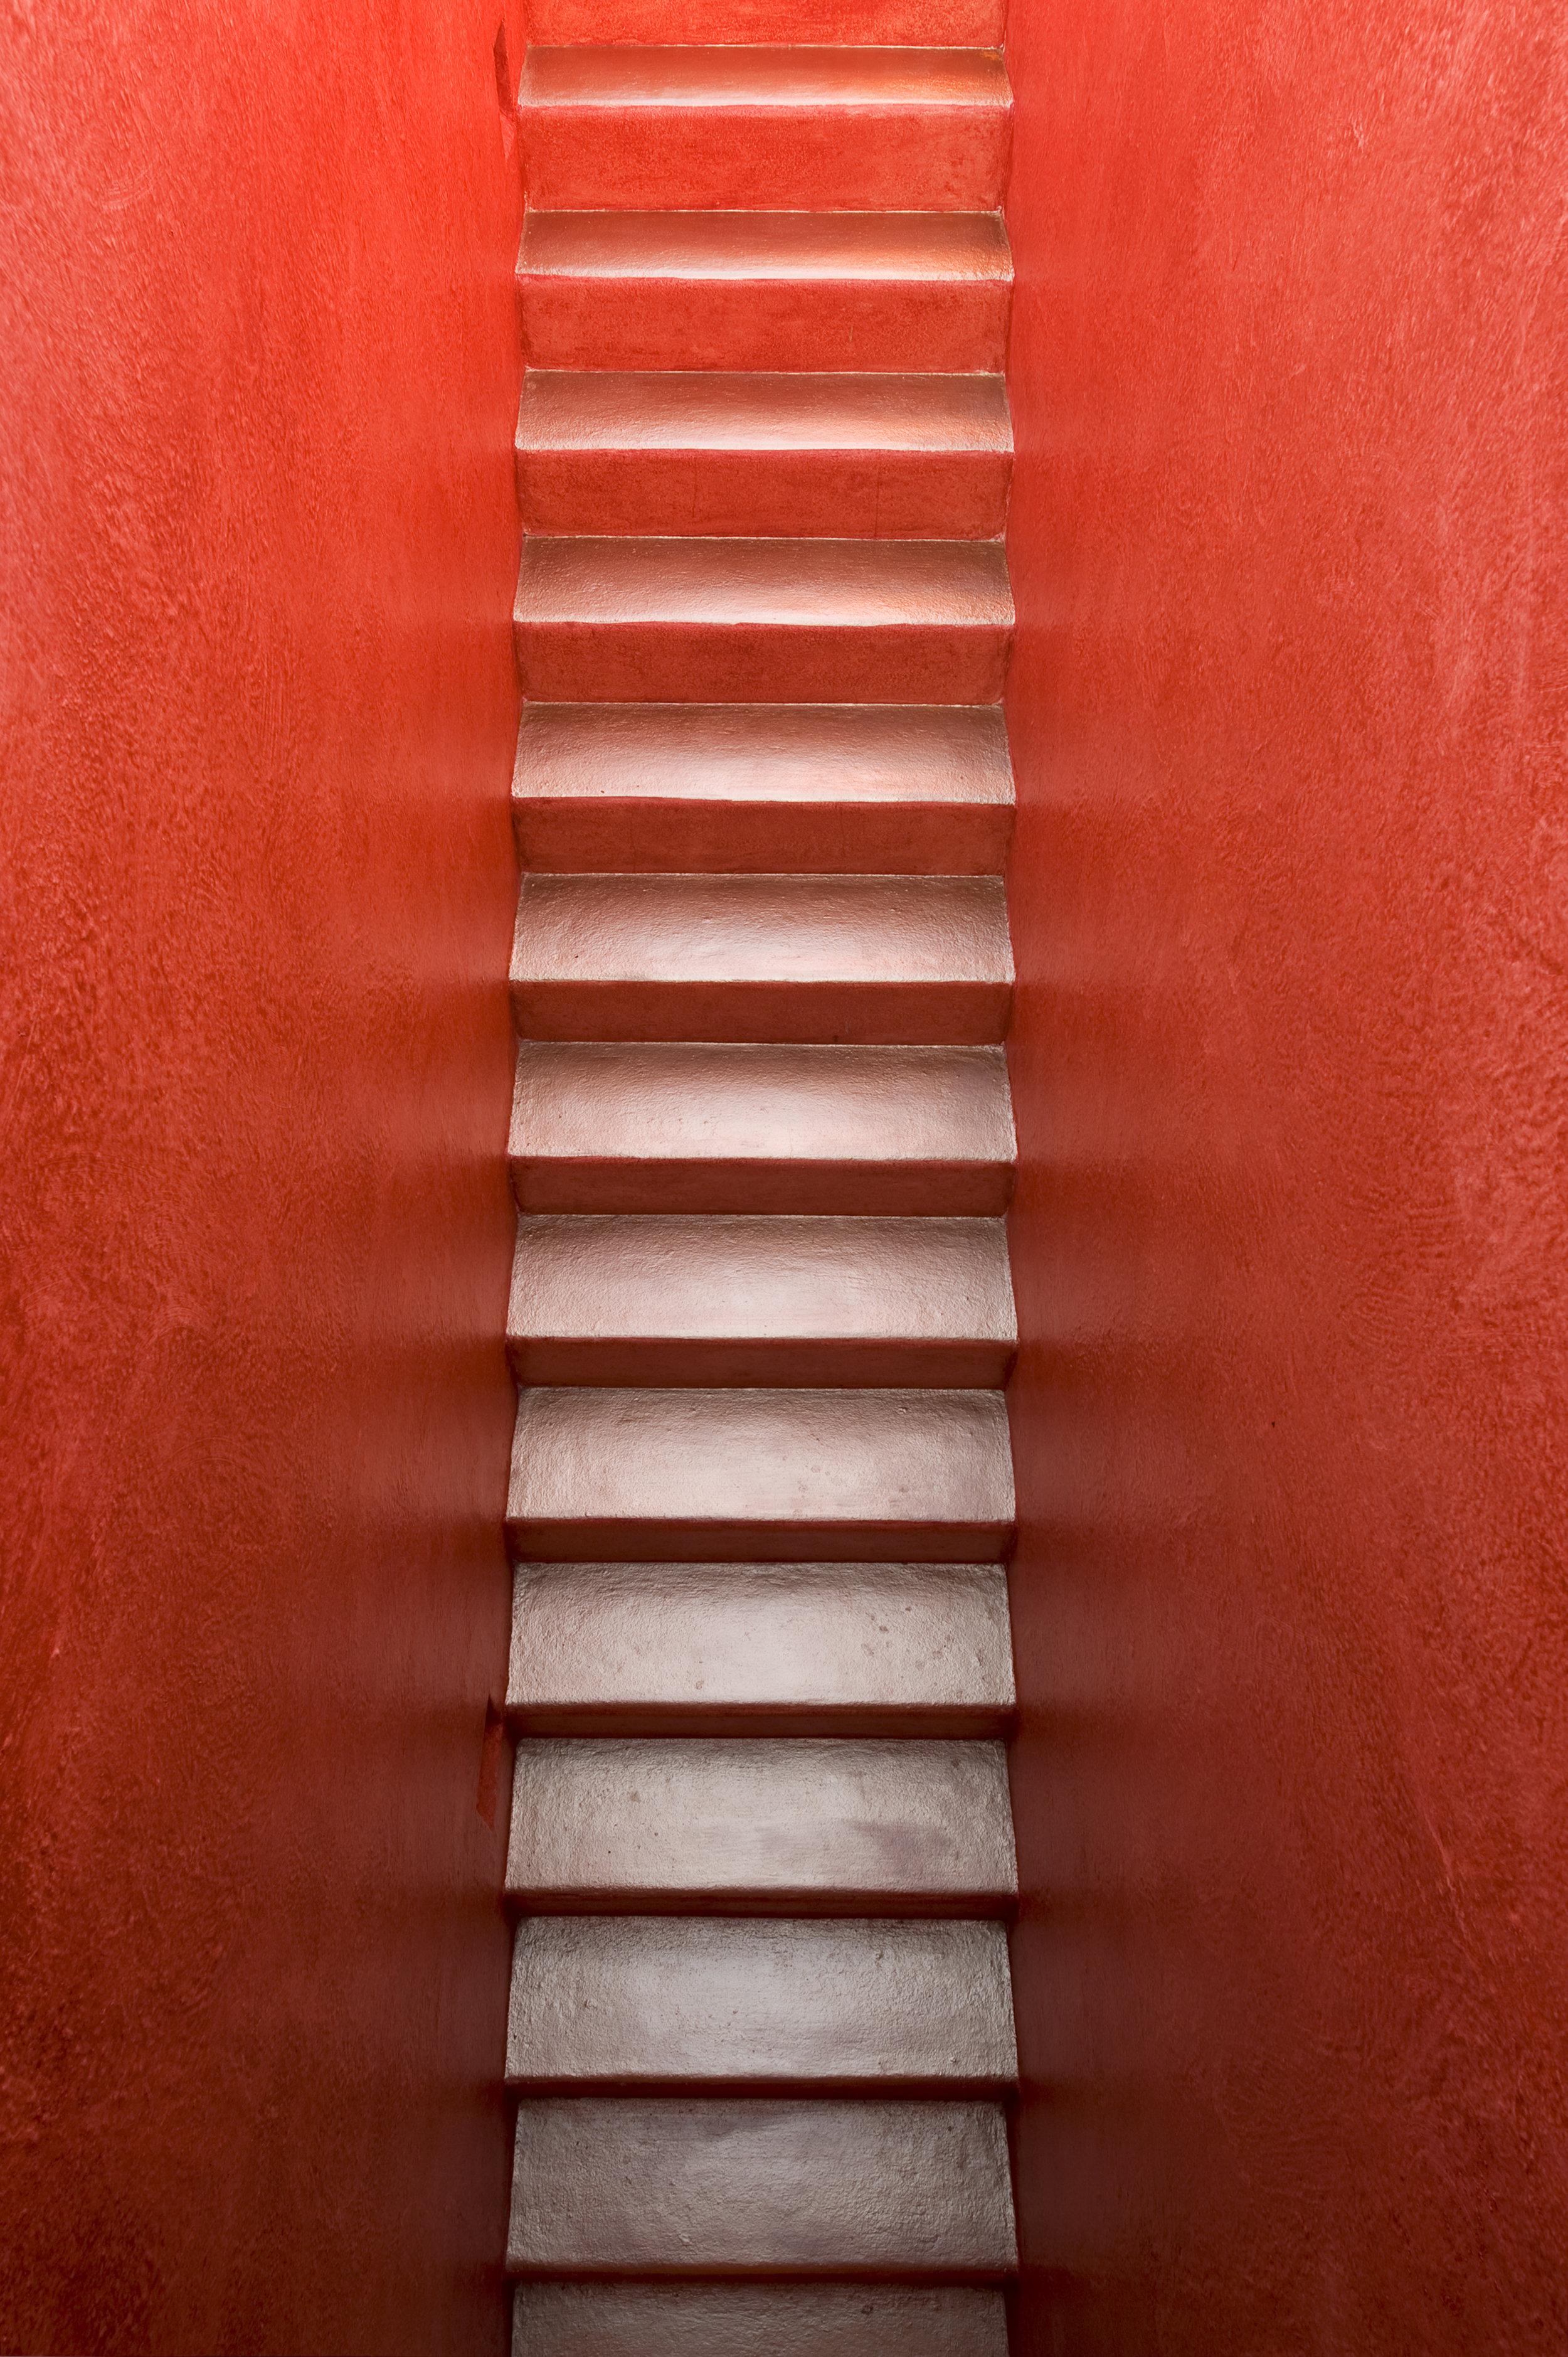 goldenstairs.jpg